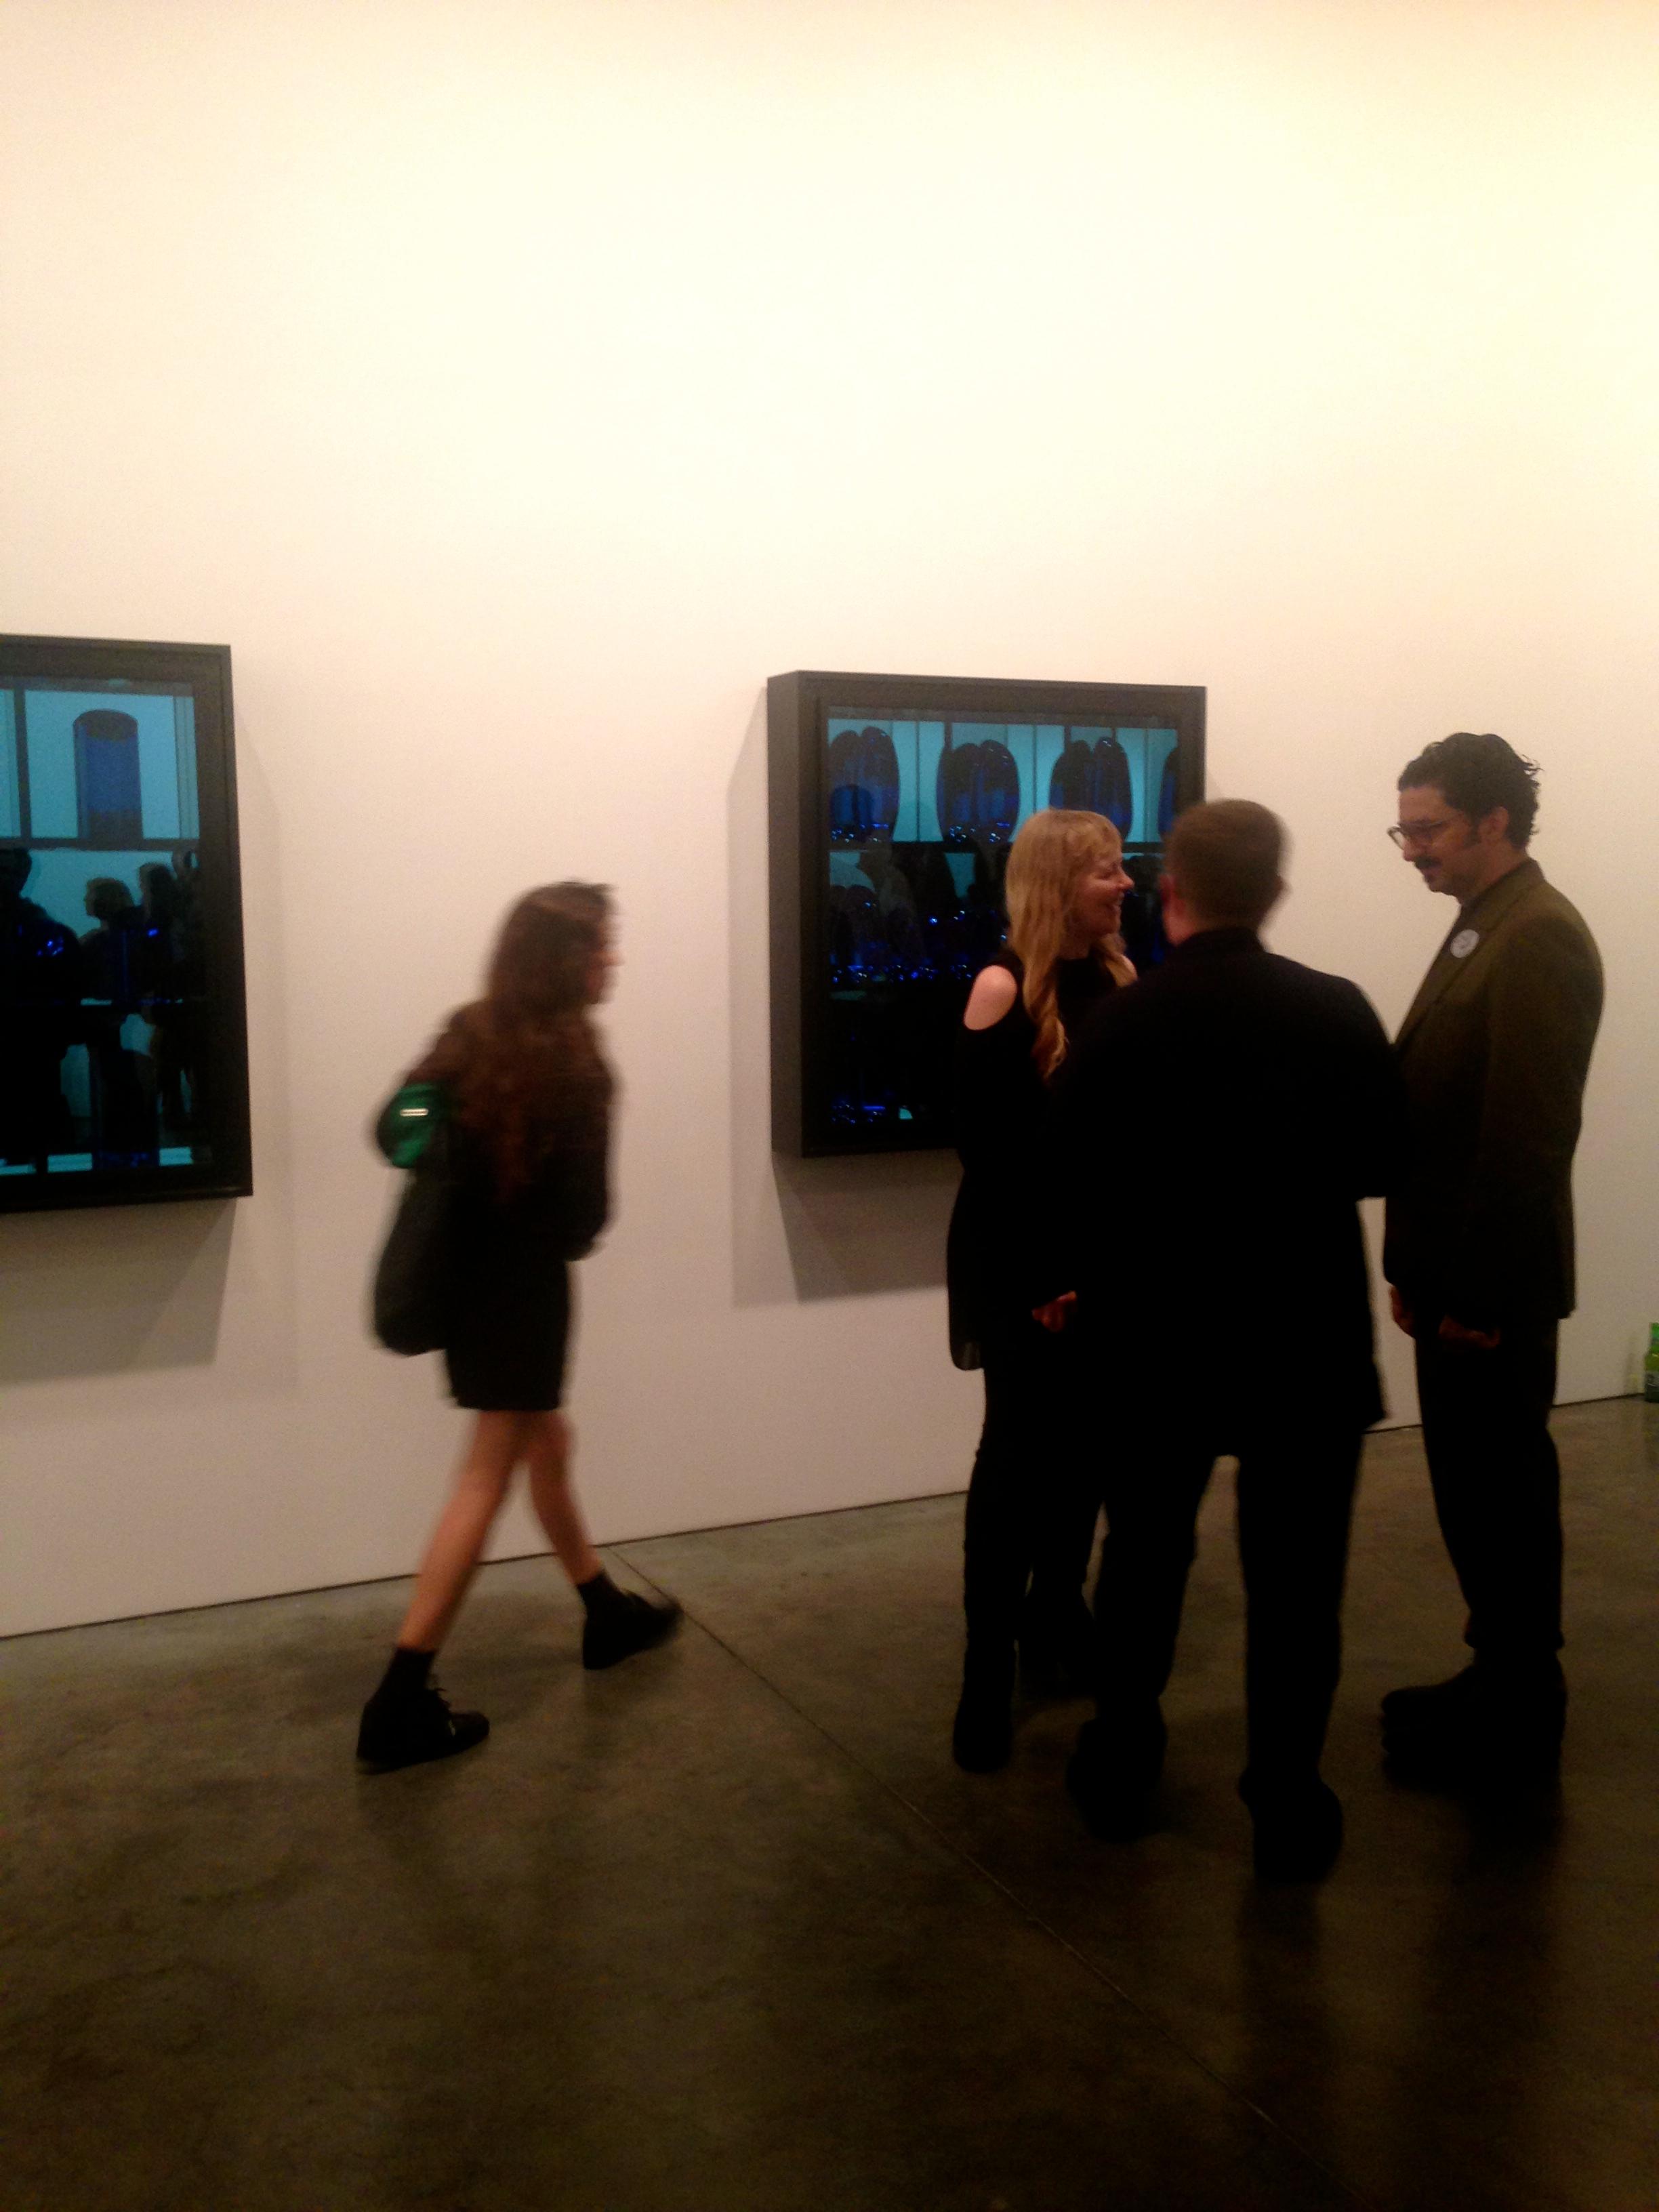 Andrea Rosen, Josiah McElheny, Blue Prism Painting V, 2015